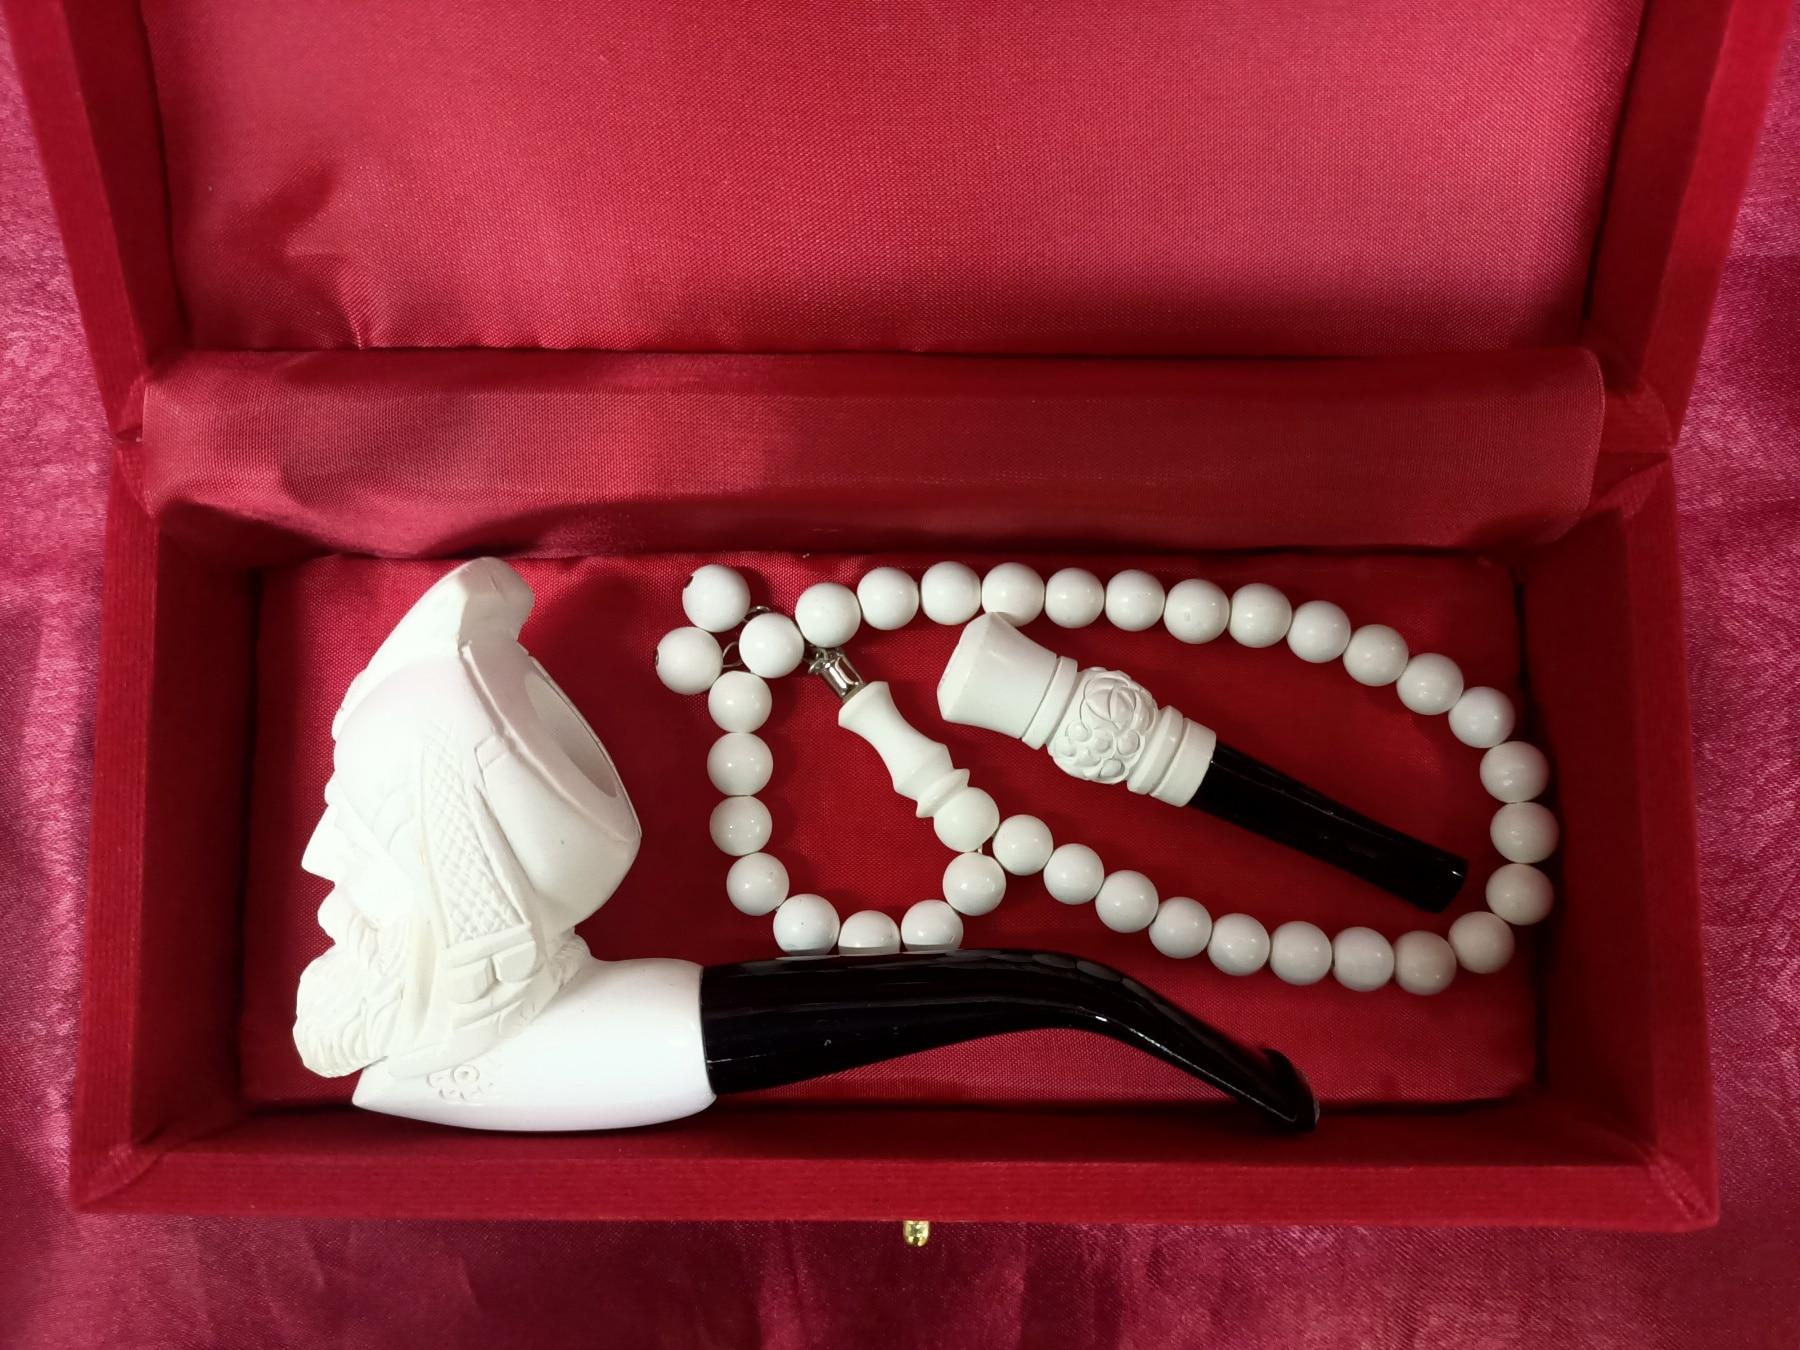 High Quality Meerschaum Set Master Made Smoking Tobacco Pipe New Cigar Sepiolite Best Gift for Friend Eskisehir made in Turkey